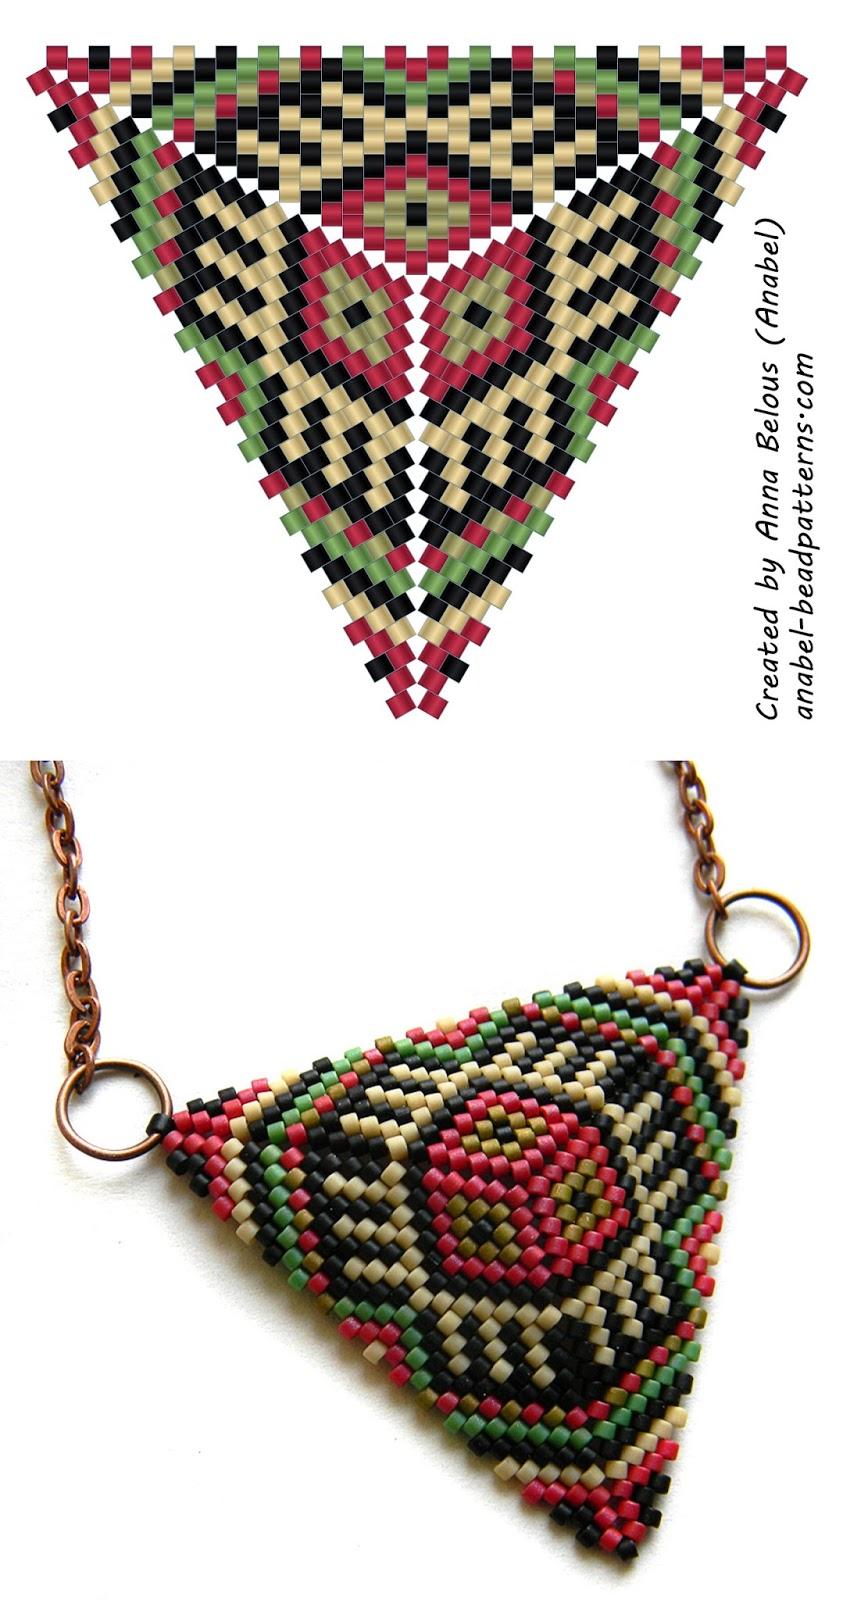 Схема бисерного треугольника - мозаичное плетение - free peyote triangle pattern